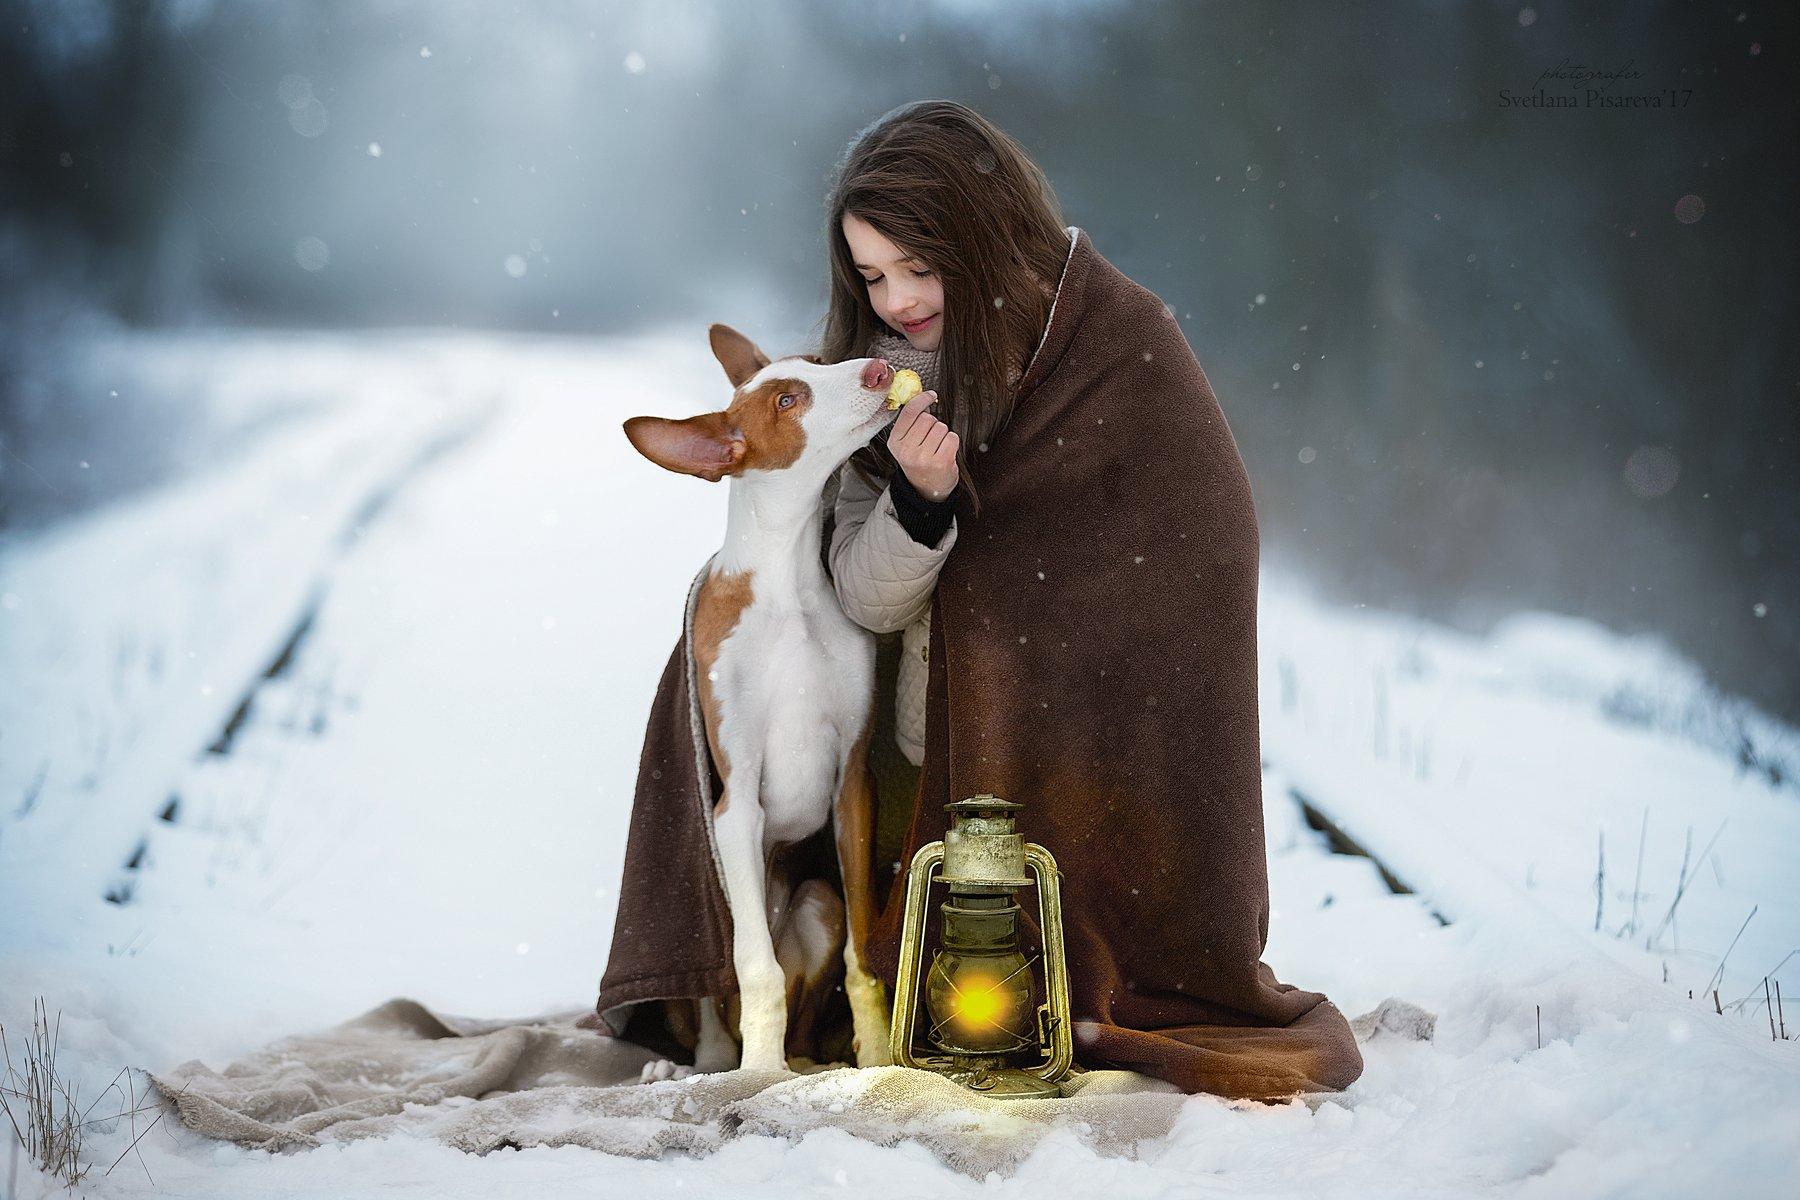 ребенок, девочка, собака, фонарь, дорога, зима., Светлана Писарева